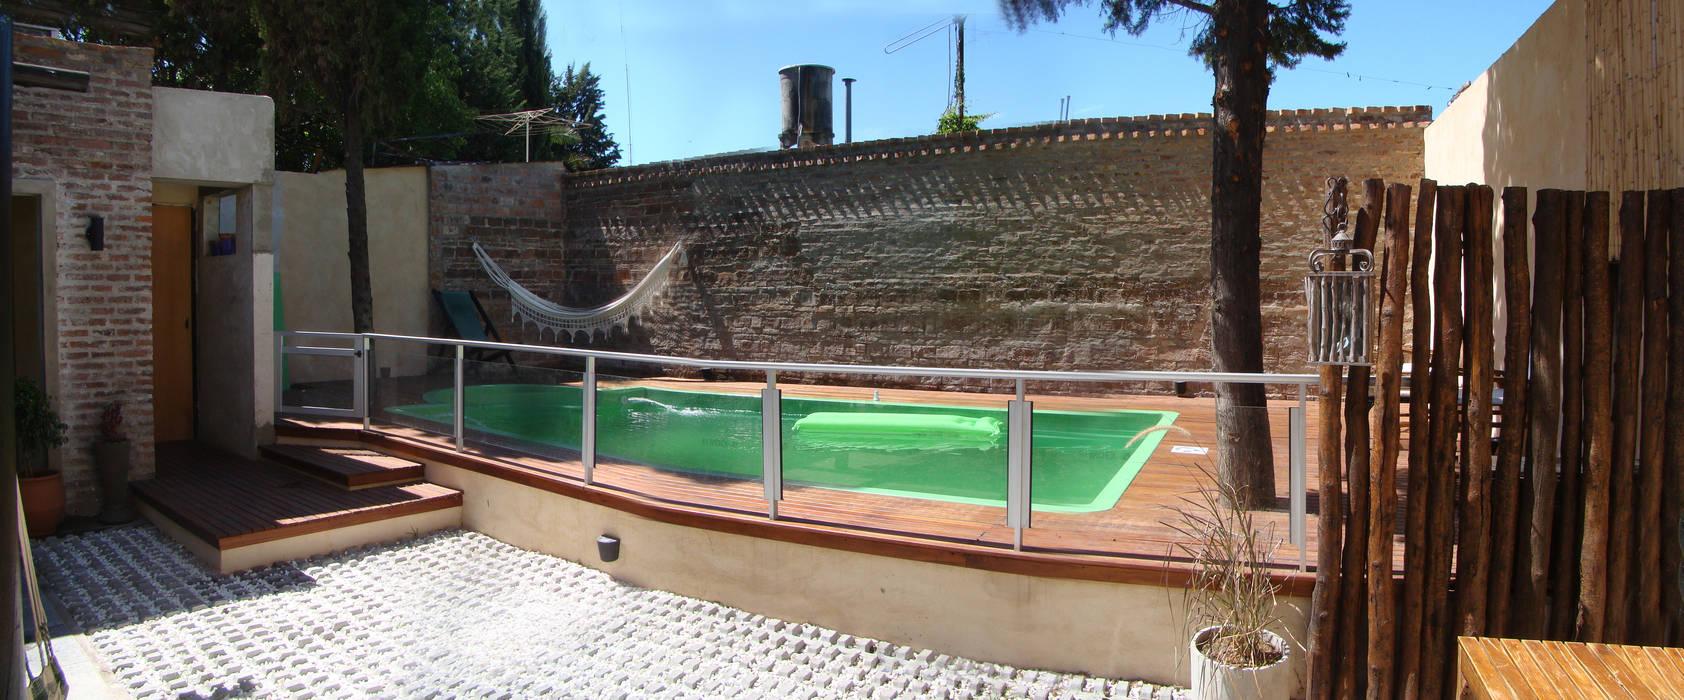 ELVARQUITECTOS Garden Pool Bricks Orange